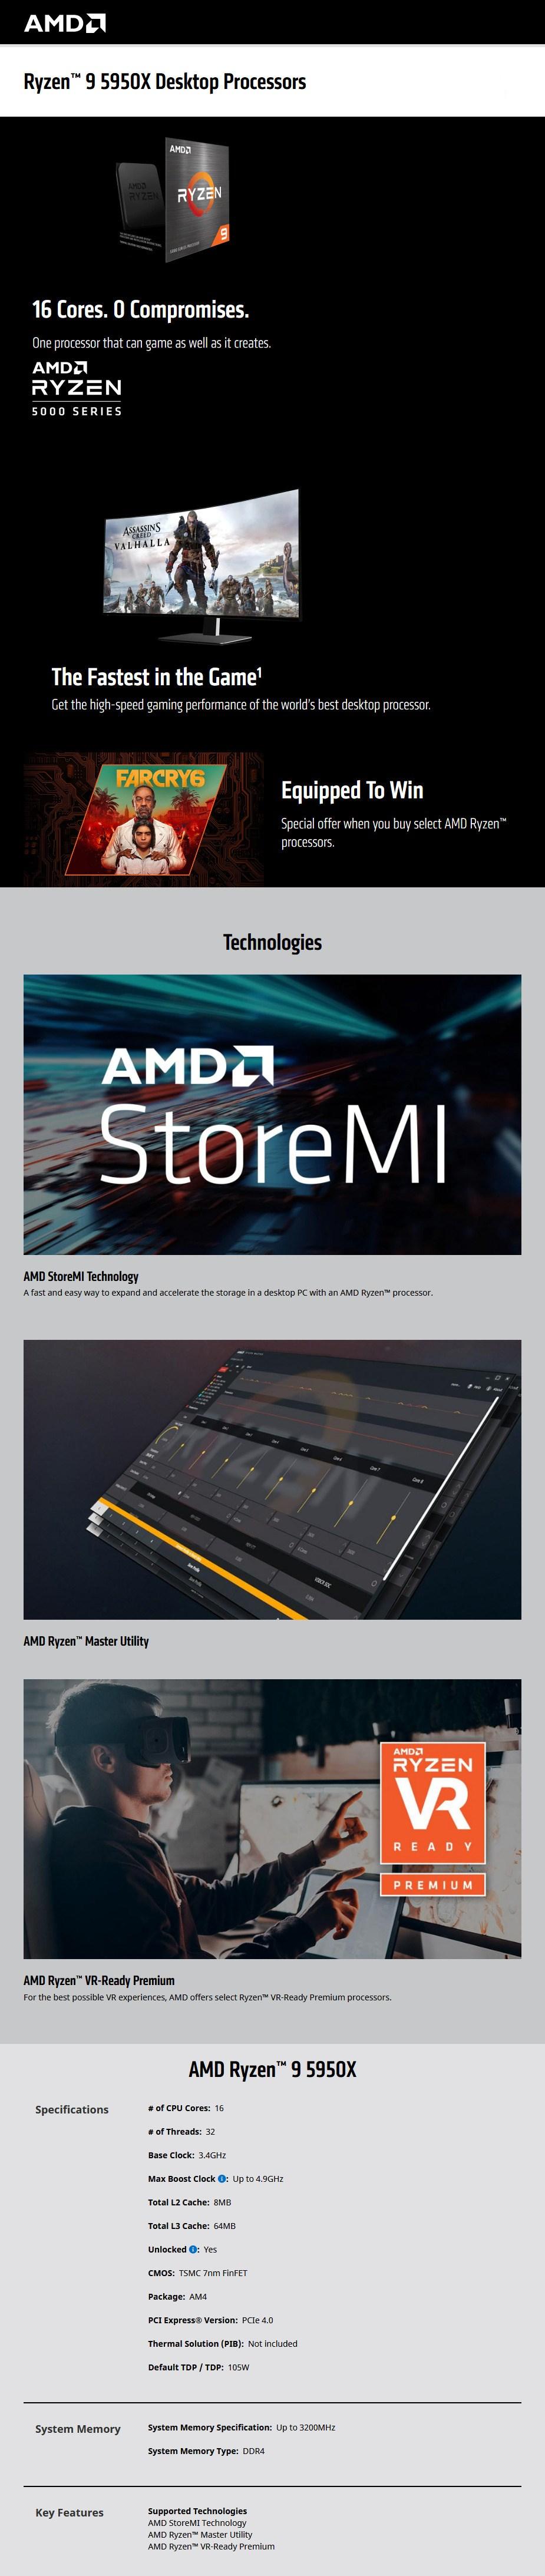 AMD Ryzen 9 5950X 16-Core AMD 3.40 GHz Unlocked CPU Processor - Overview 1